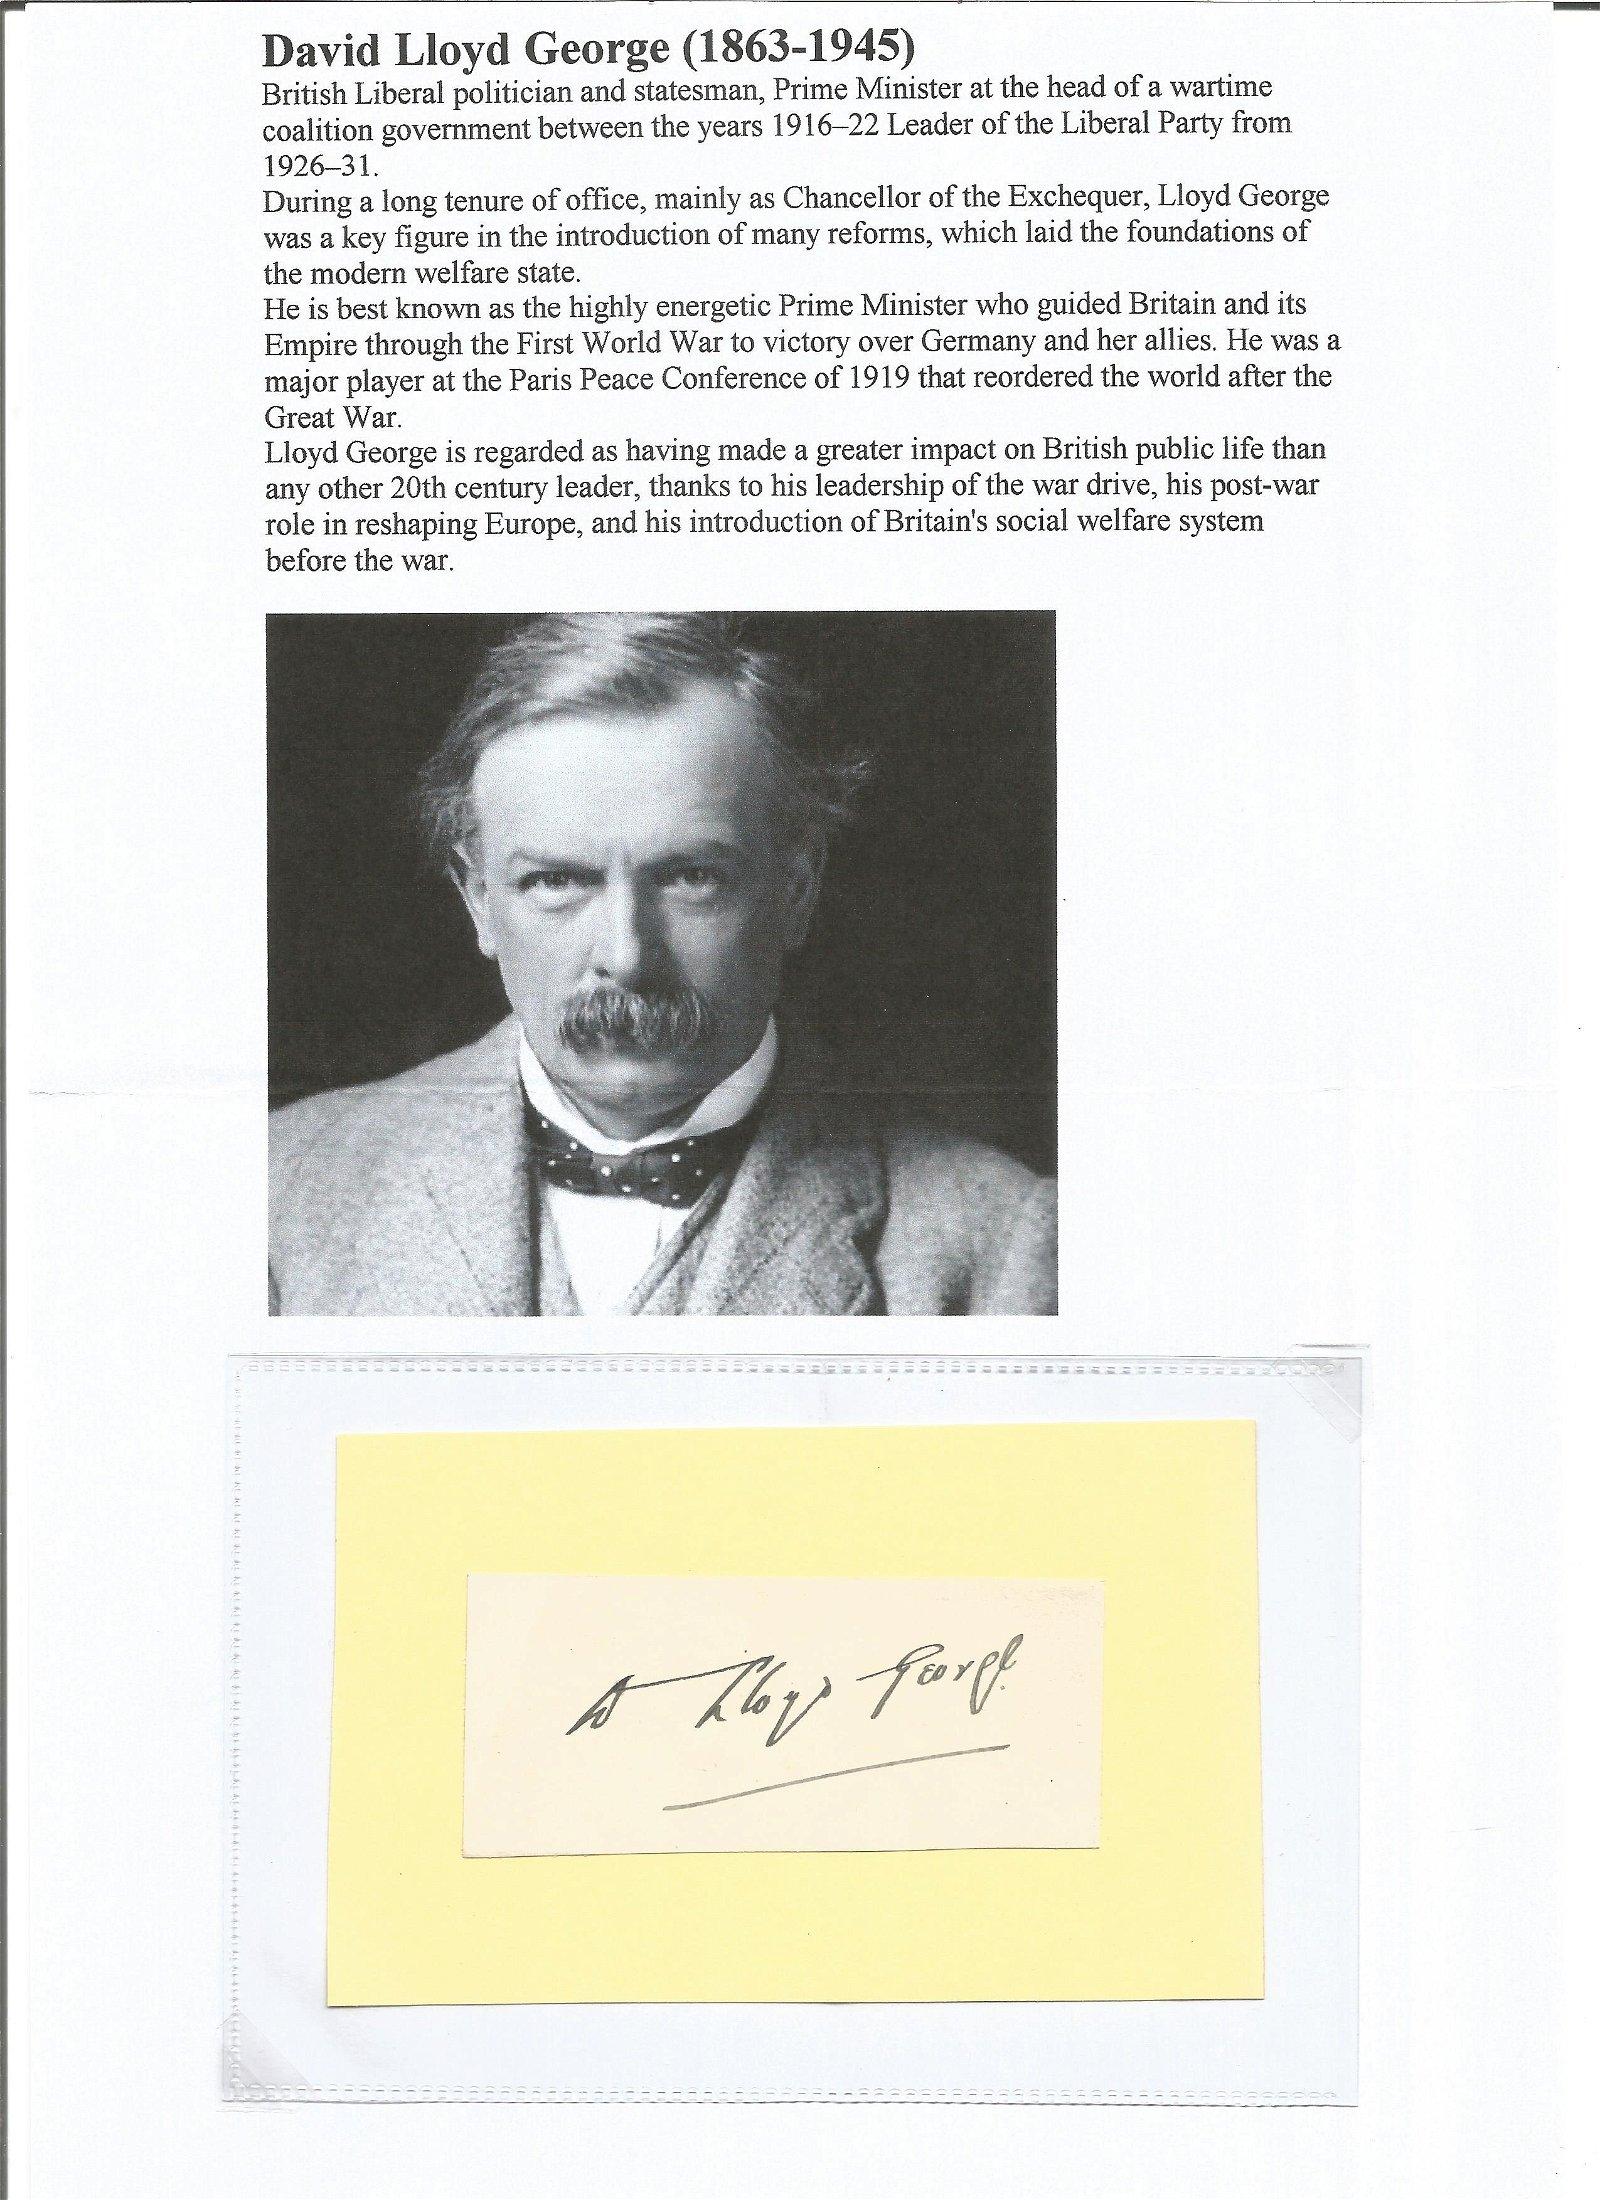 David Lloyd George 1863 1945 signature. PM between 1926